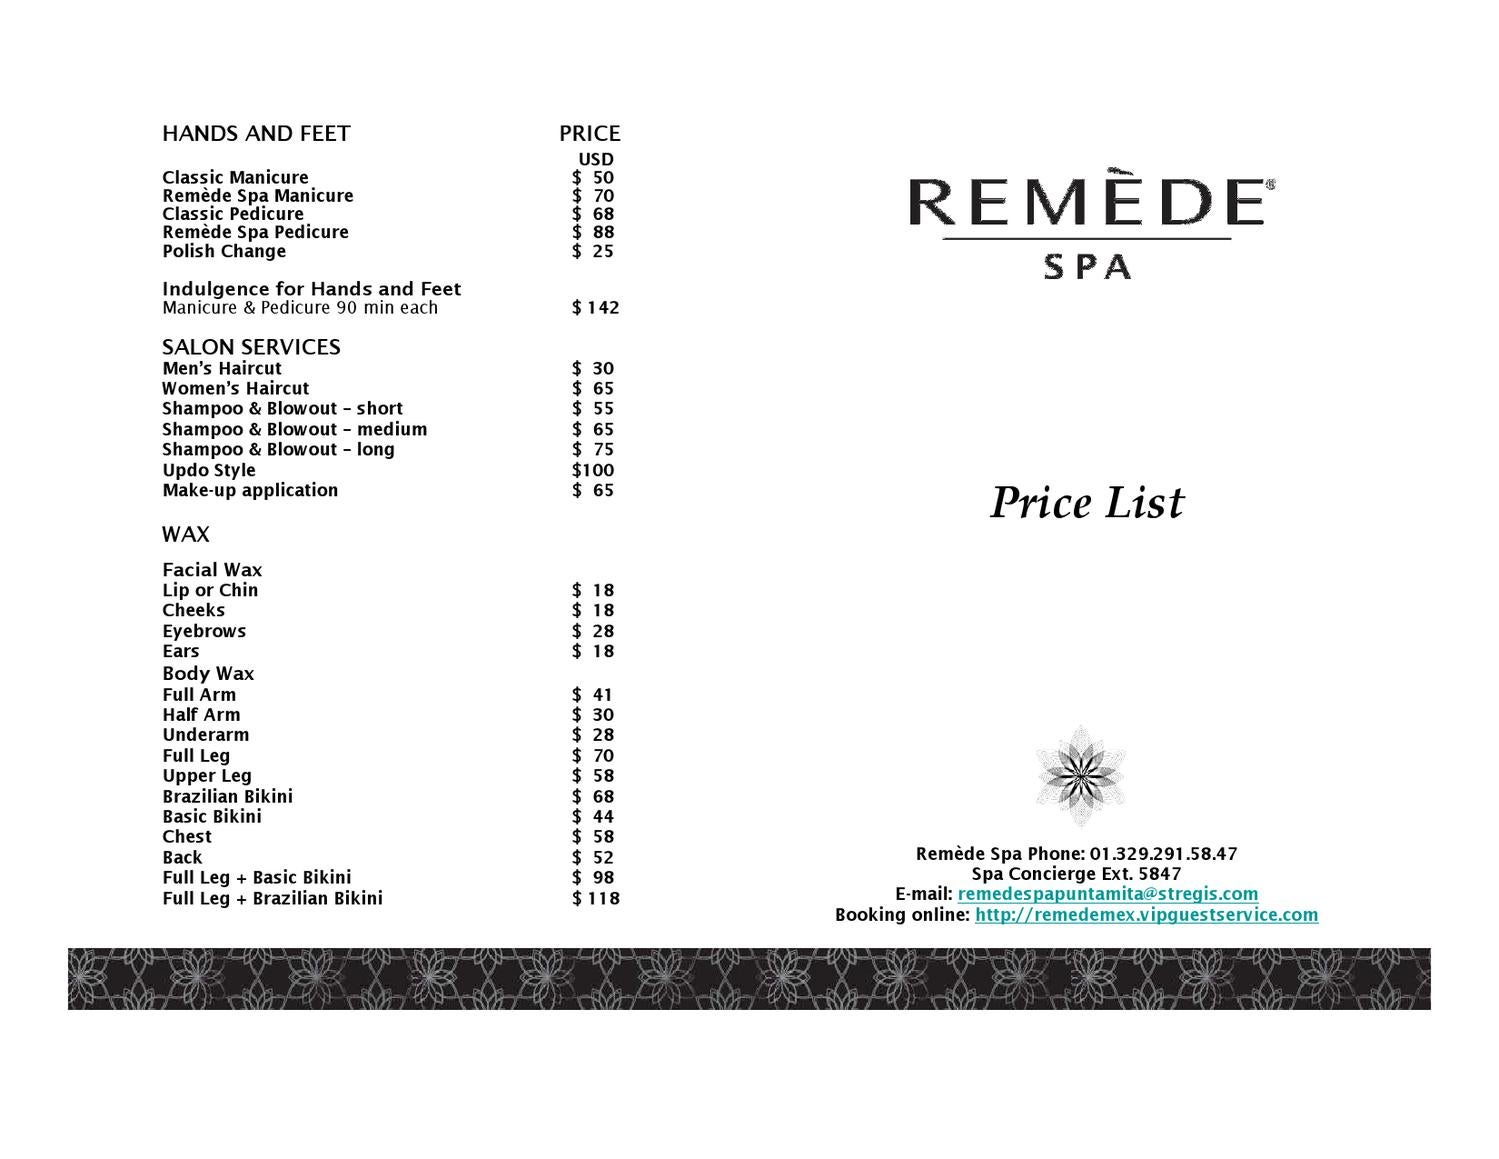 Remede Spa Price List By The St Regis Punta Mita Issuu